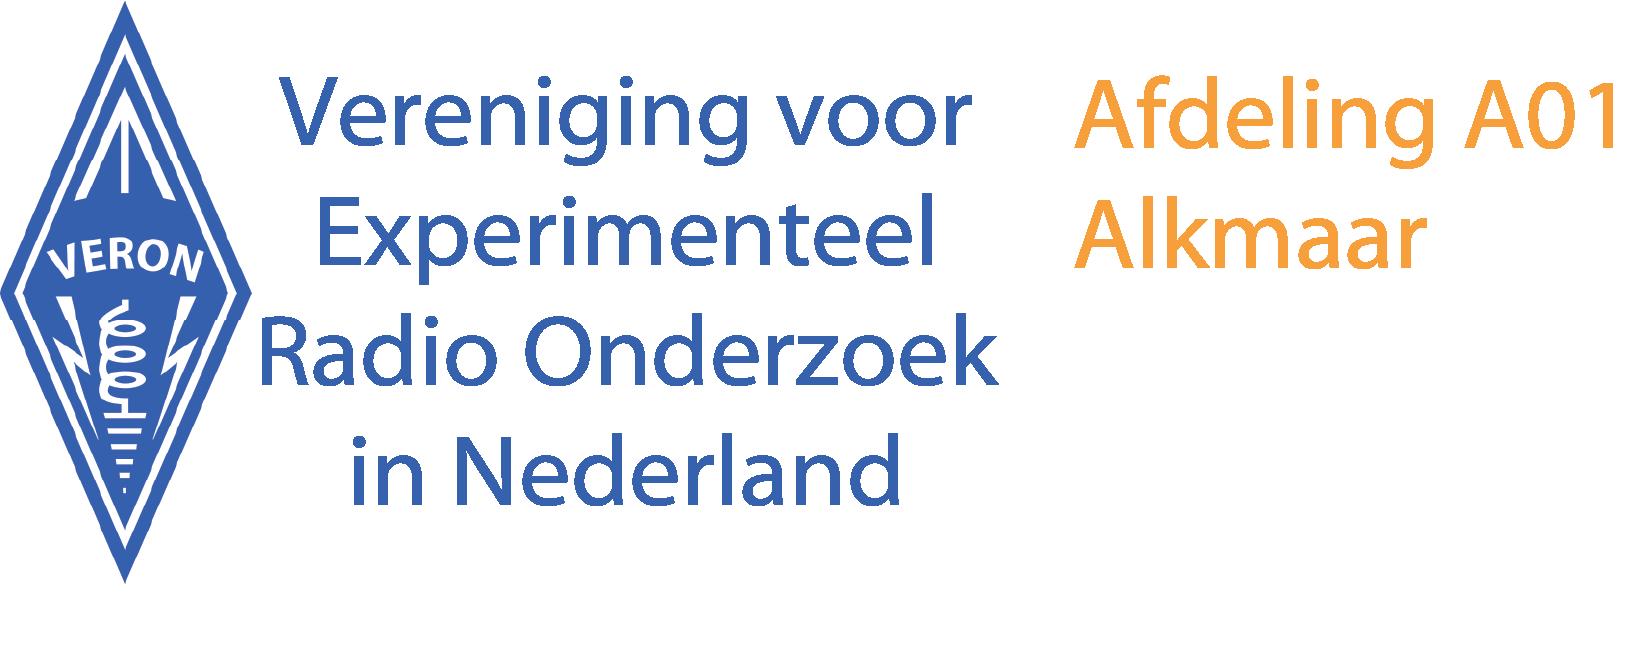 VERON a01 - Alkmaar